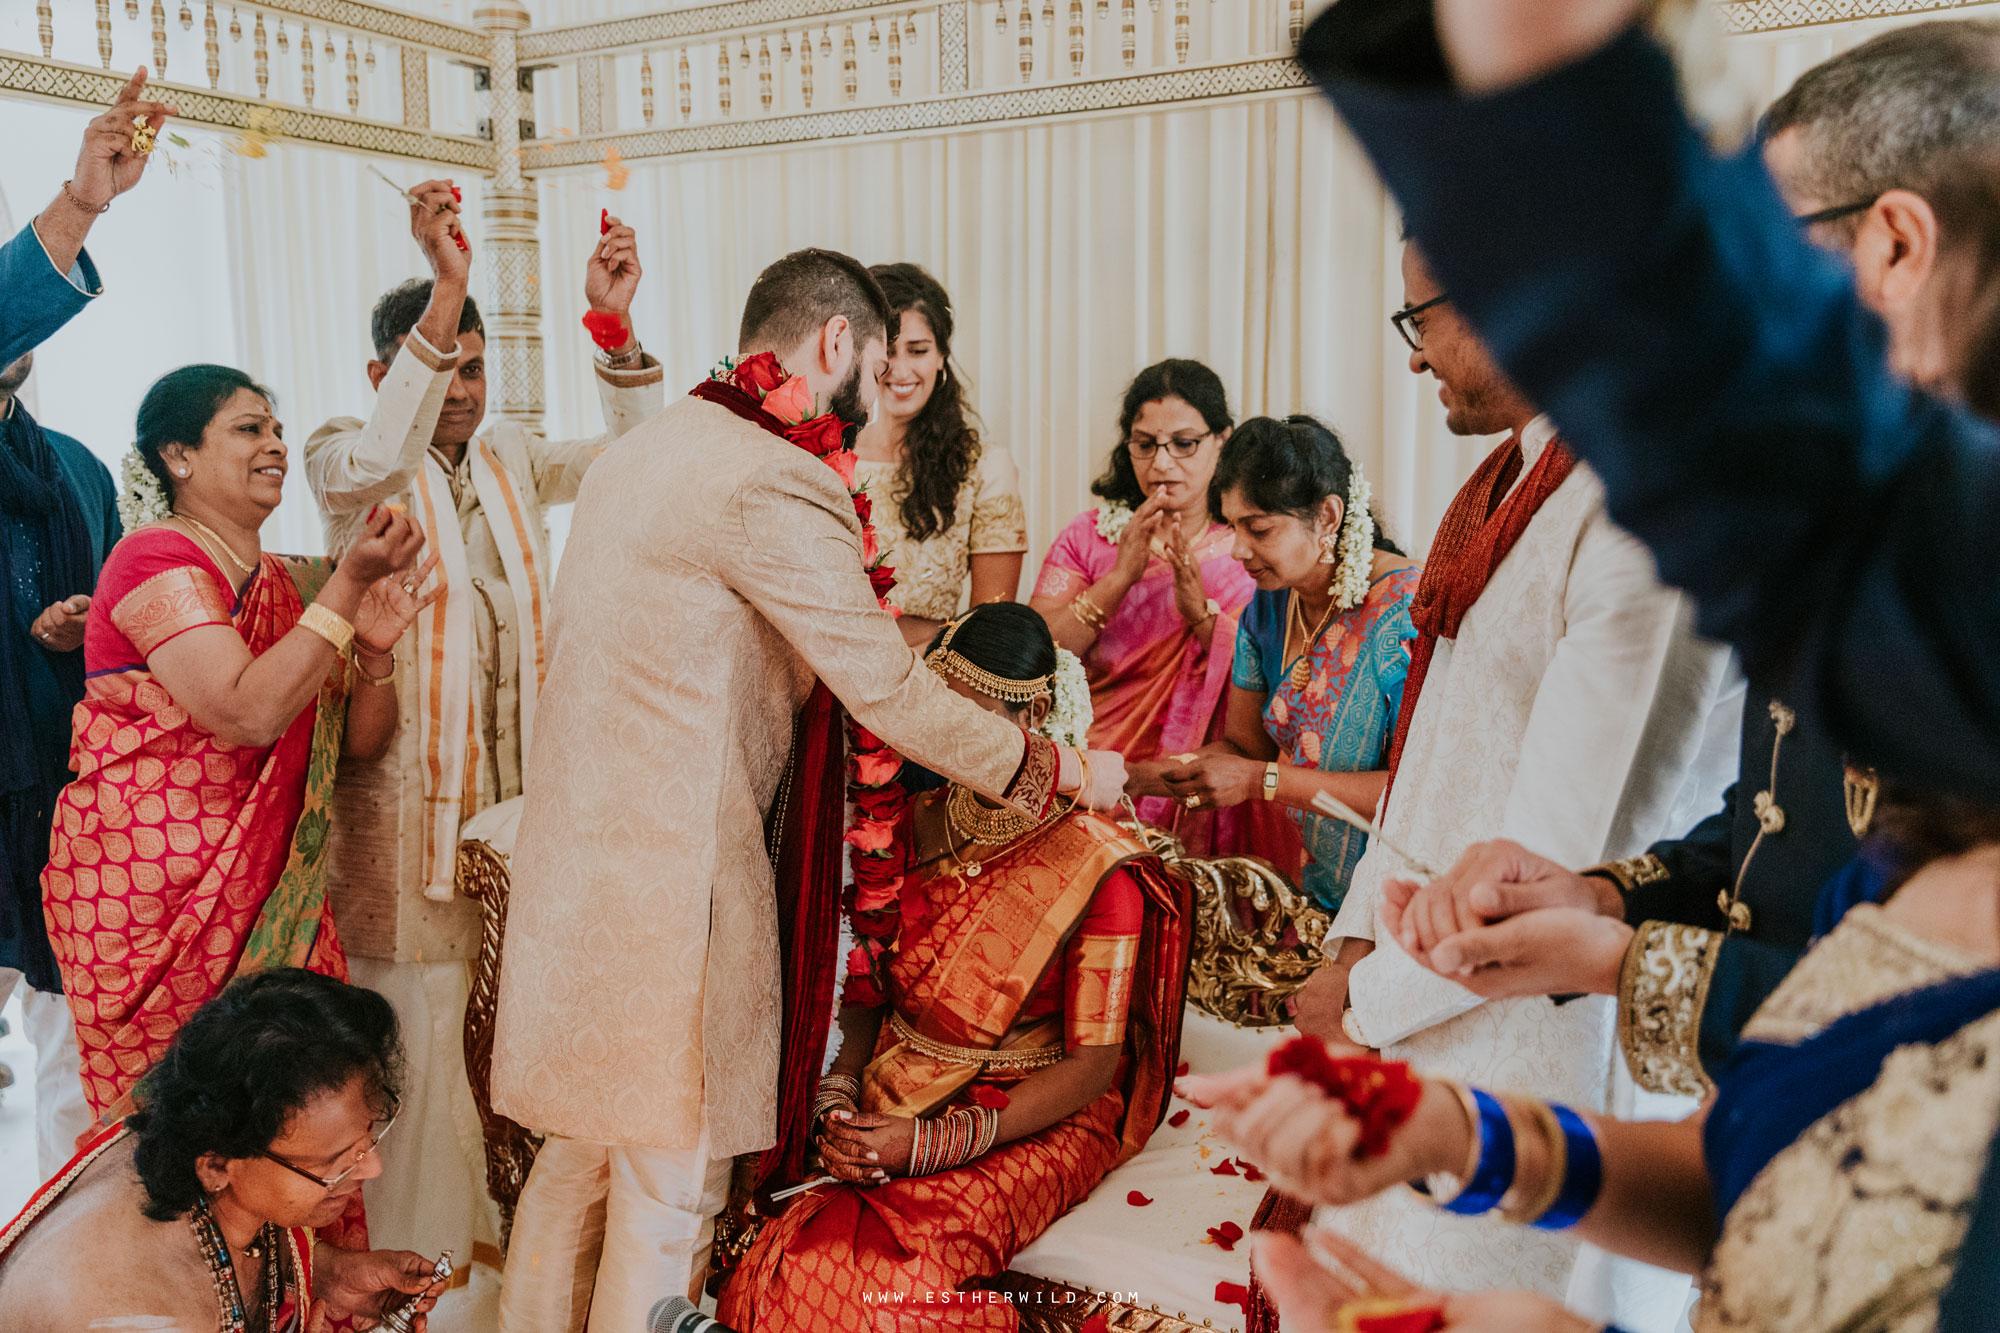 Northbrook_Park_Farnham_Surrey_London_Wedding_Hindu_Fusion_Esther_Wild_Photographer_IMG_4501.jpg